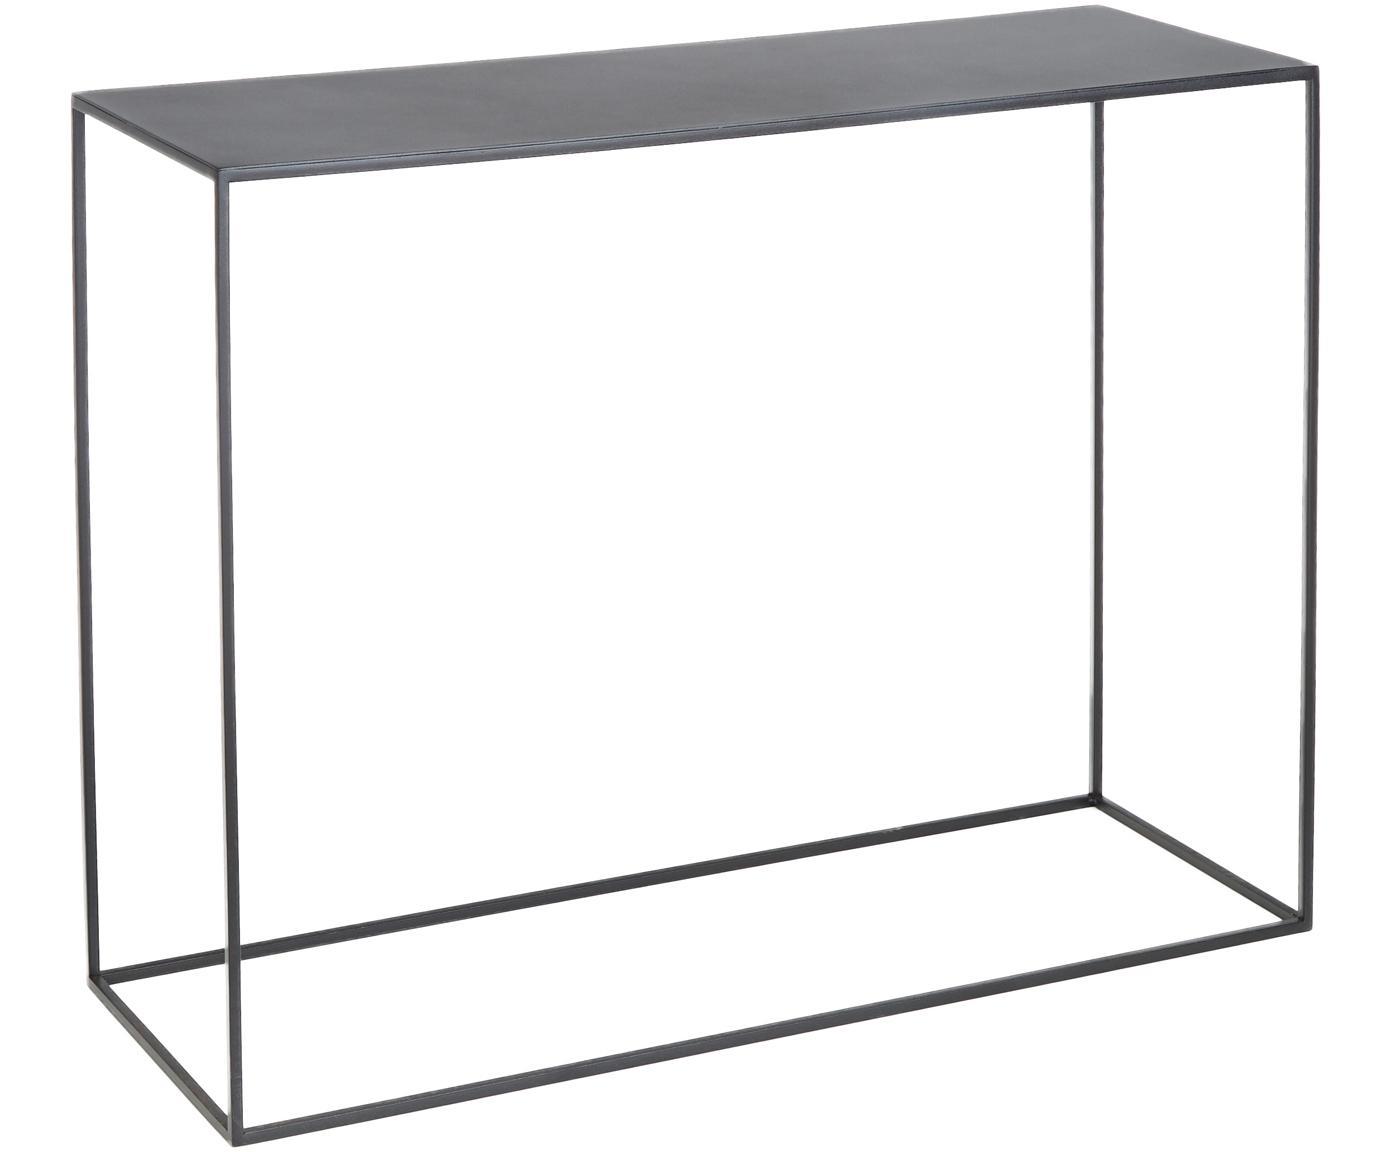 Consola de metal Tensio negra, Metal con pintura en polvo, Negro, An 100 x F 35 cm